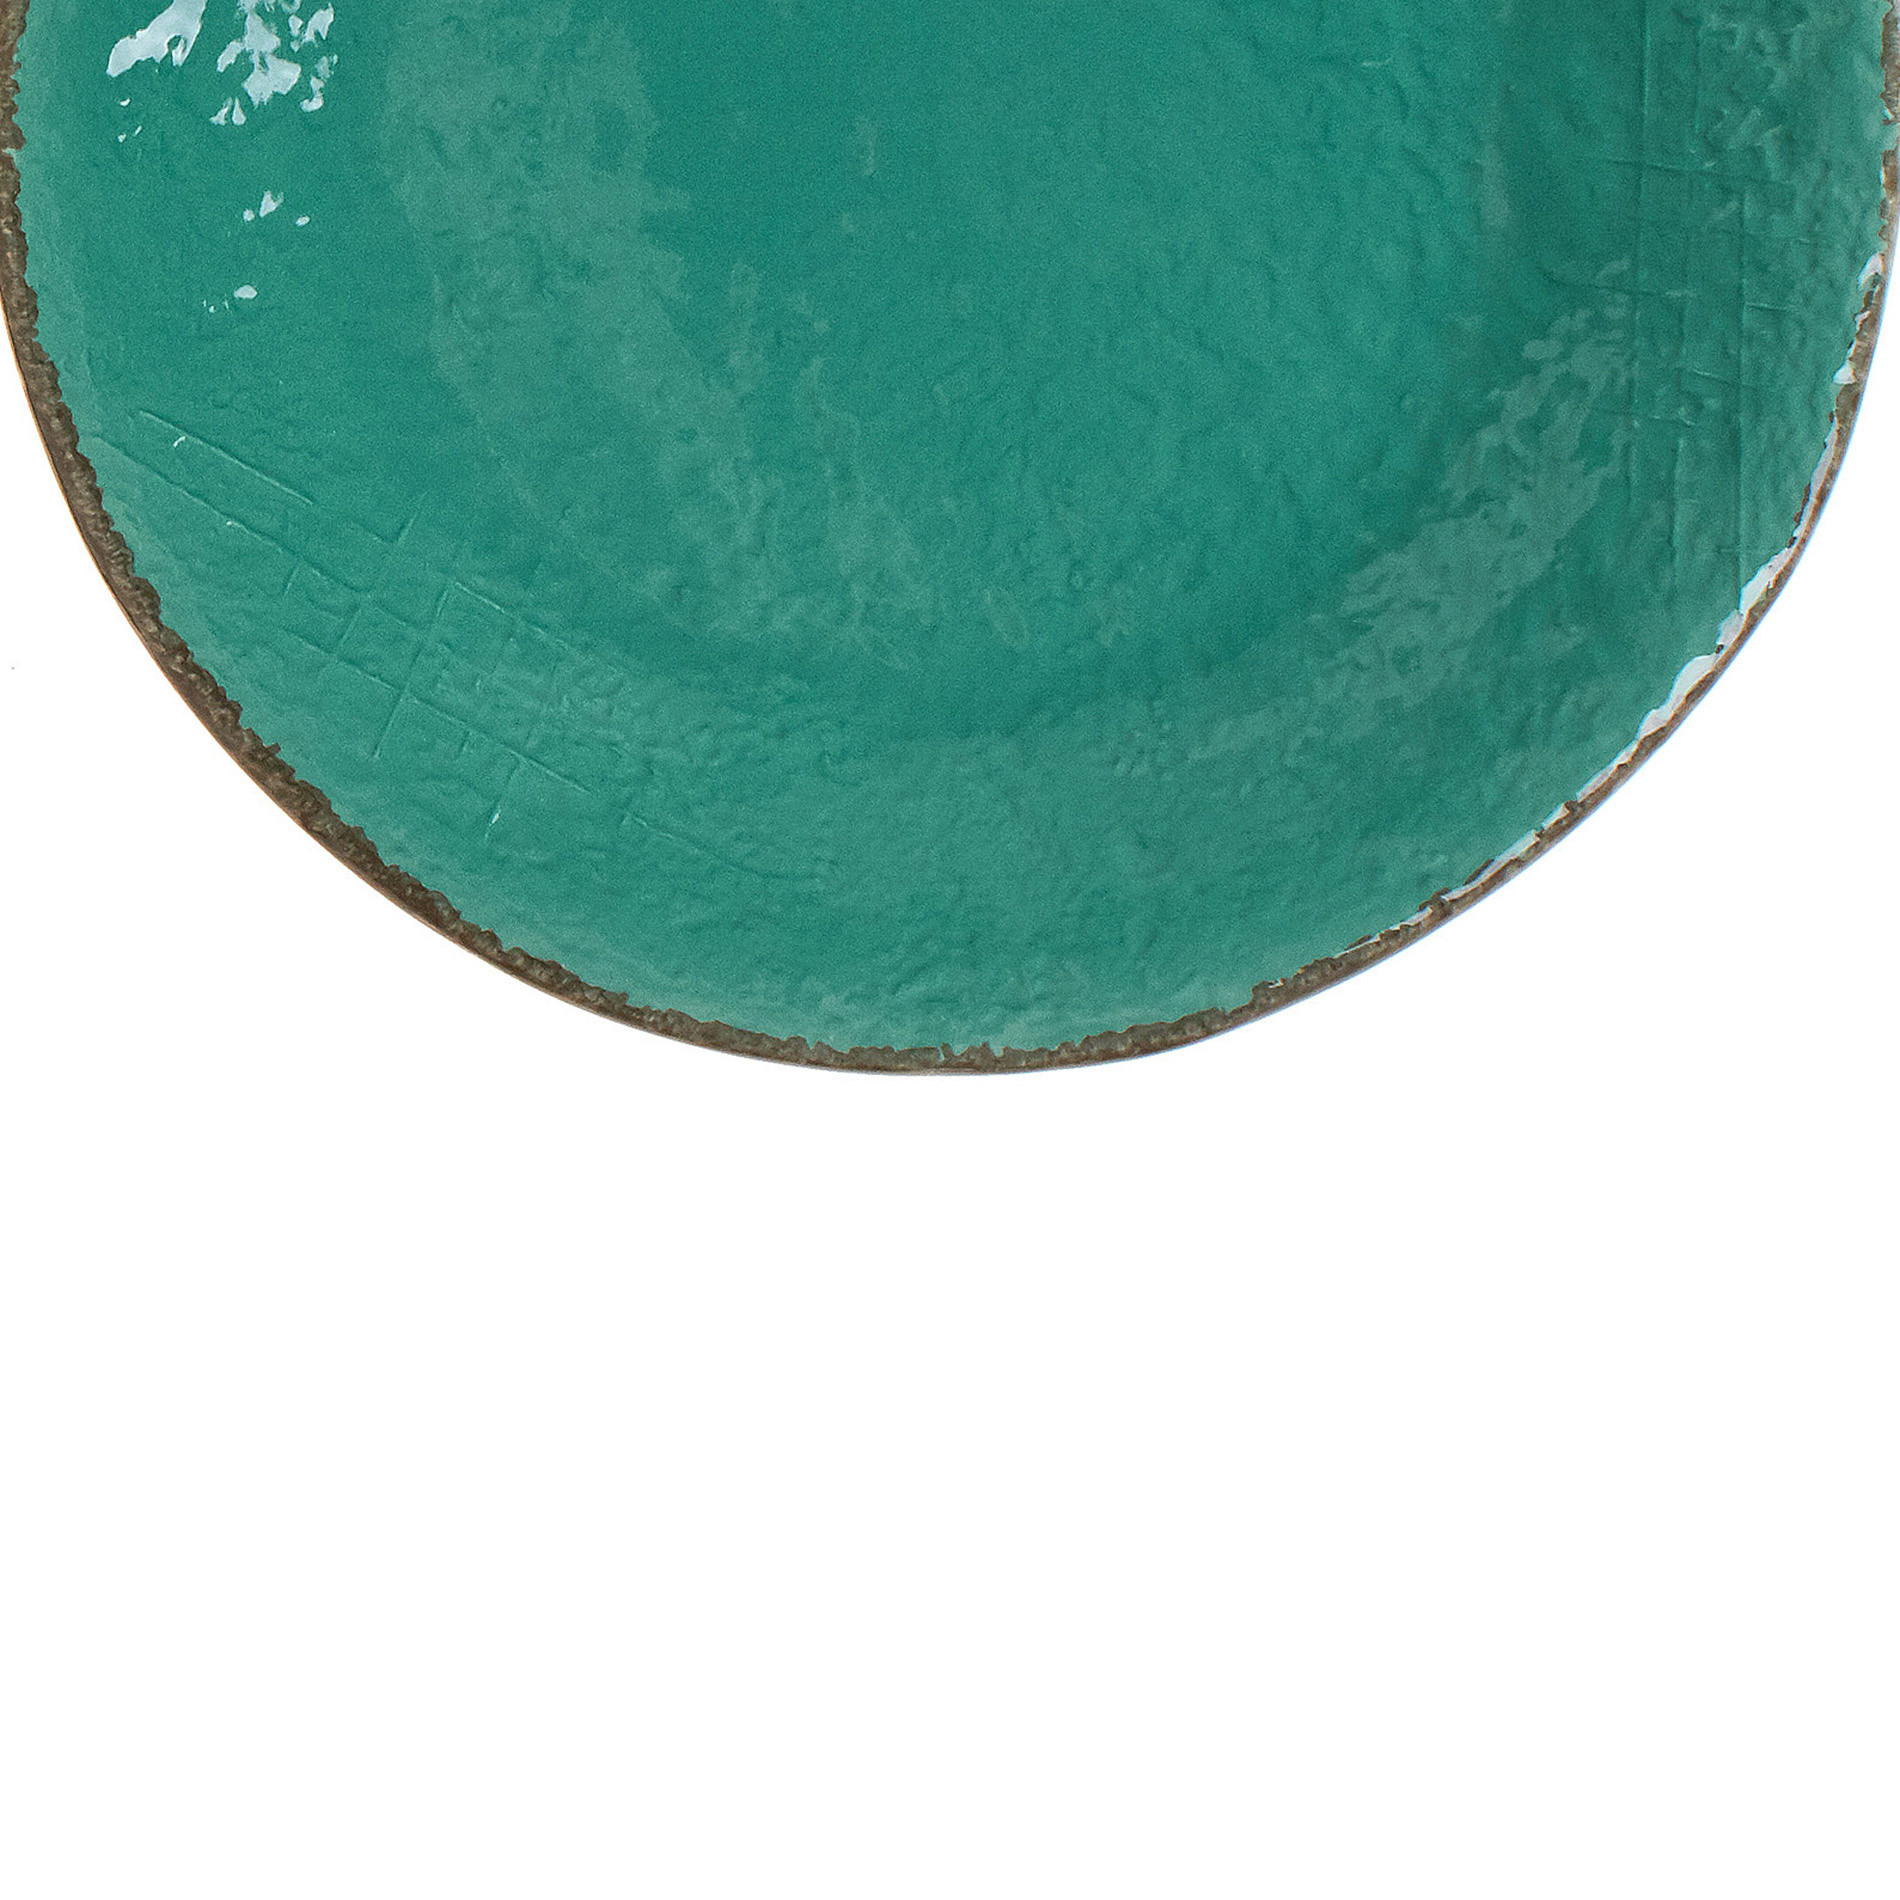 Piatto frutta ceramica artigianale Preta, Verde acqua, large image number 2